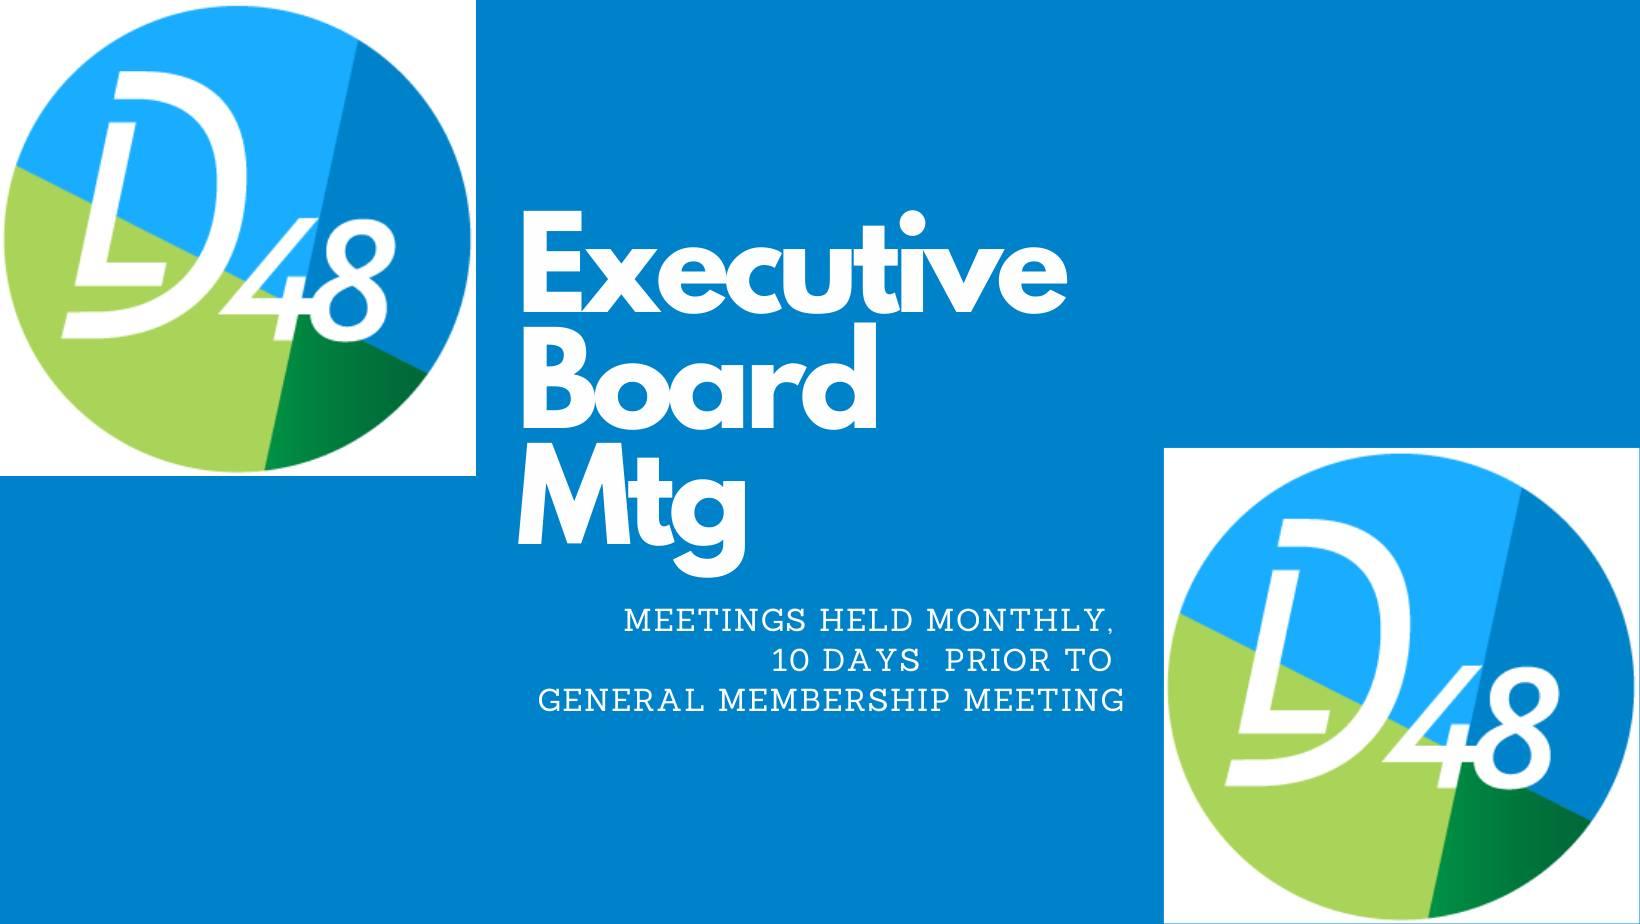 Eboard Meeting